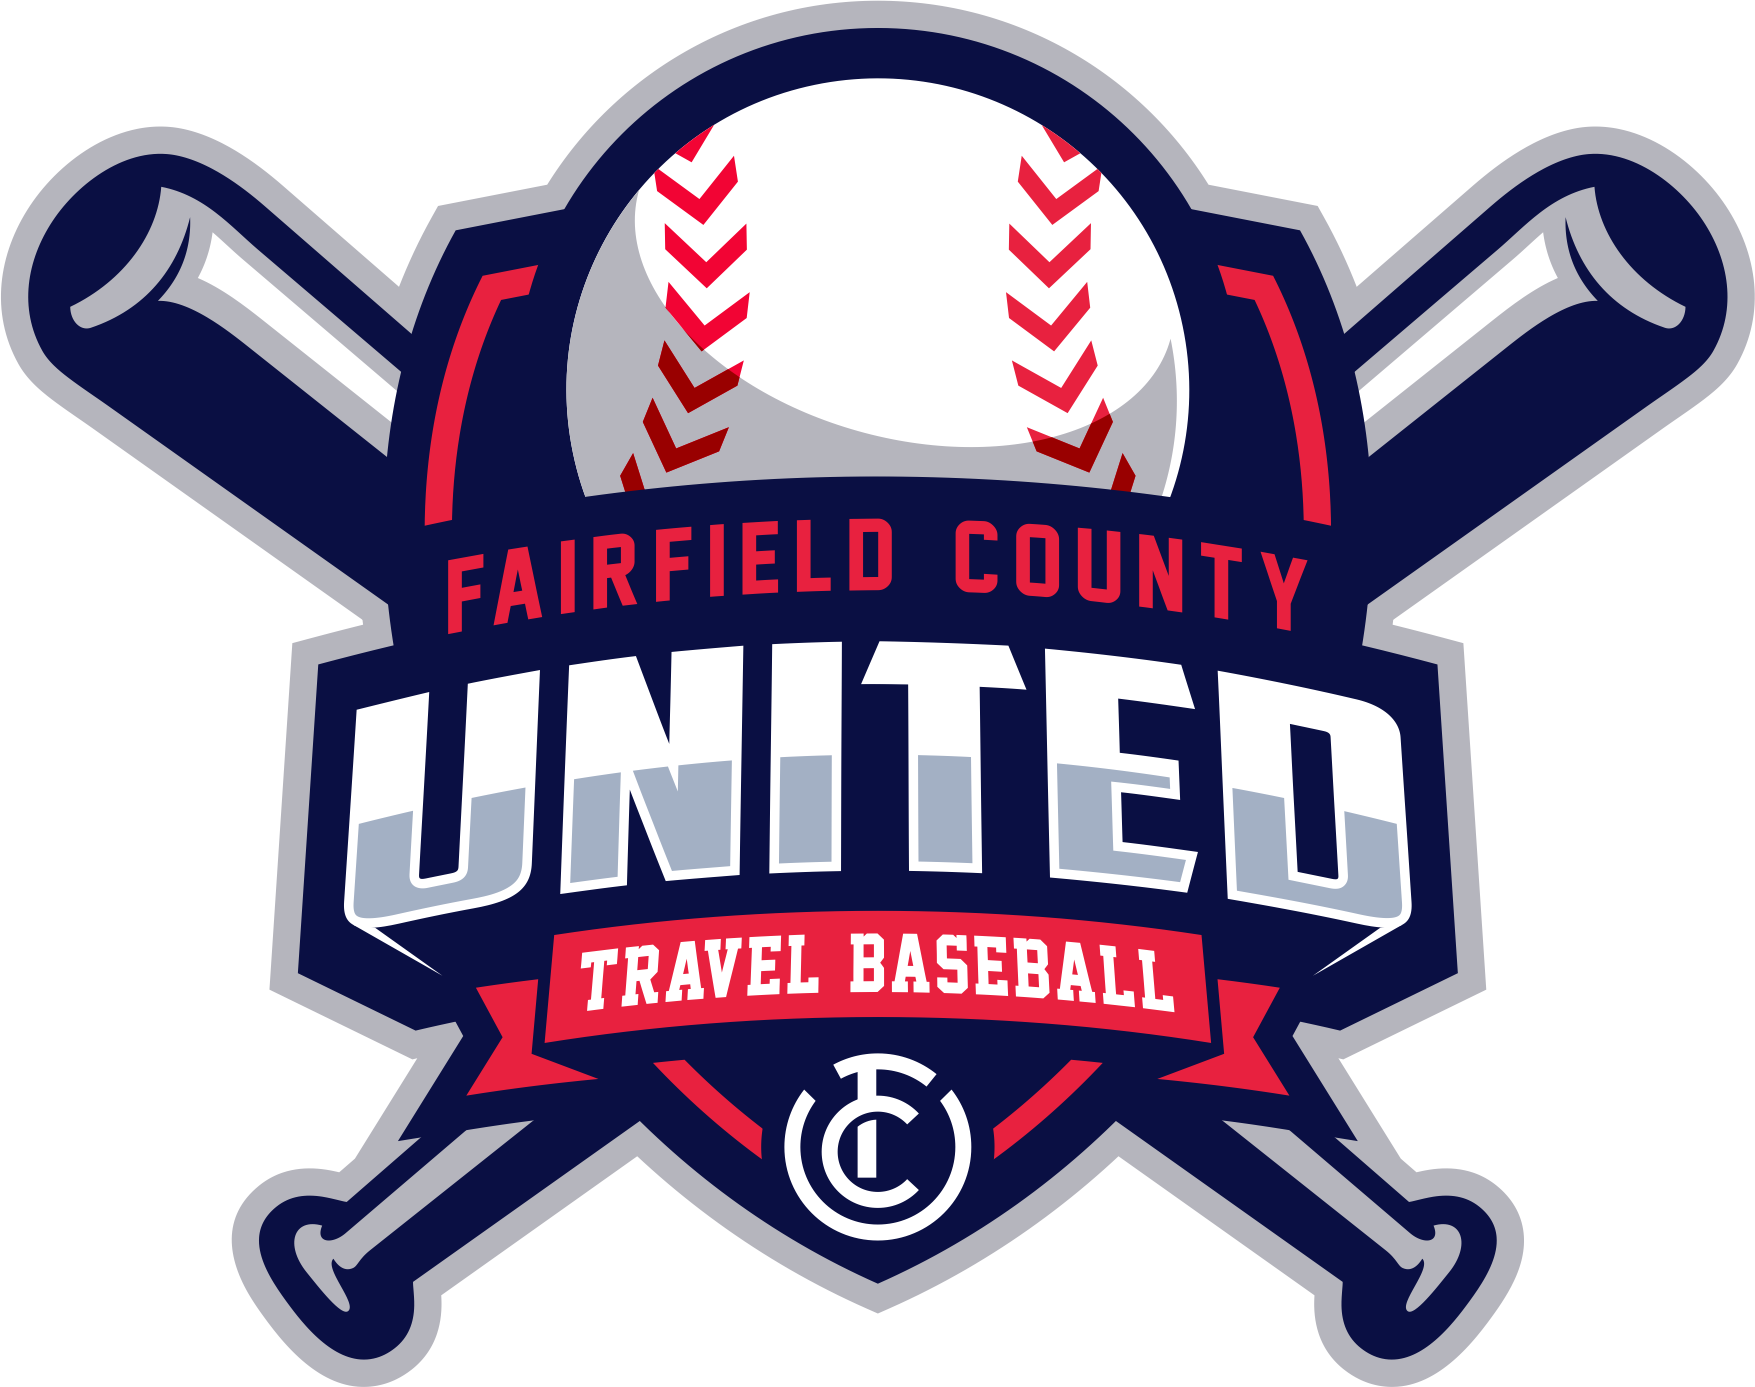 Fairfield County UNITED Travel Baseball